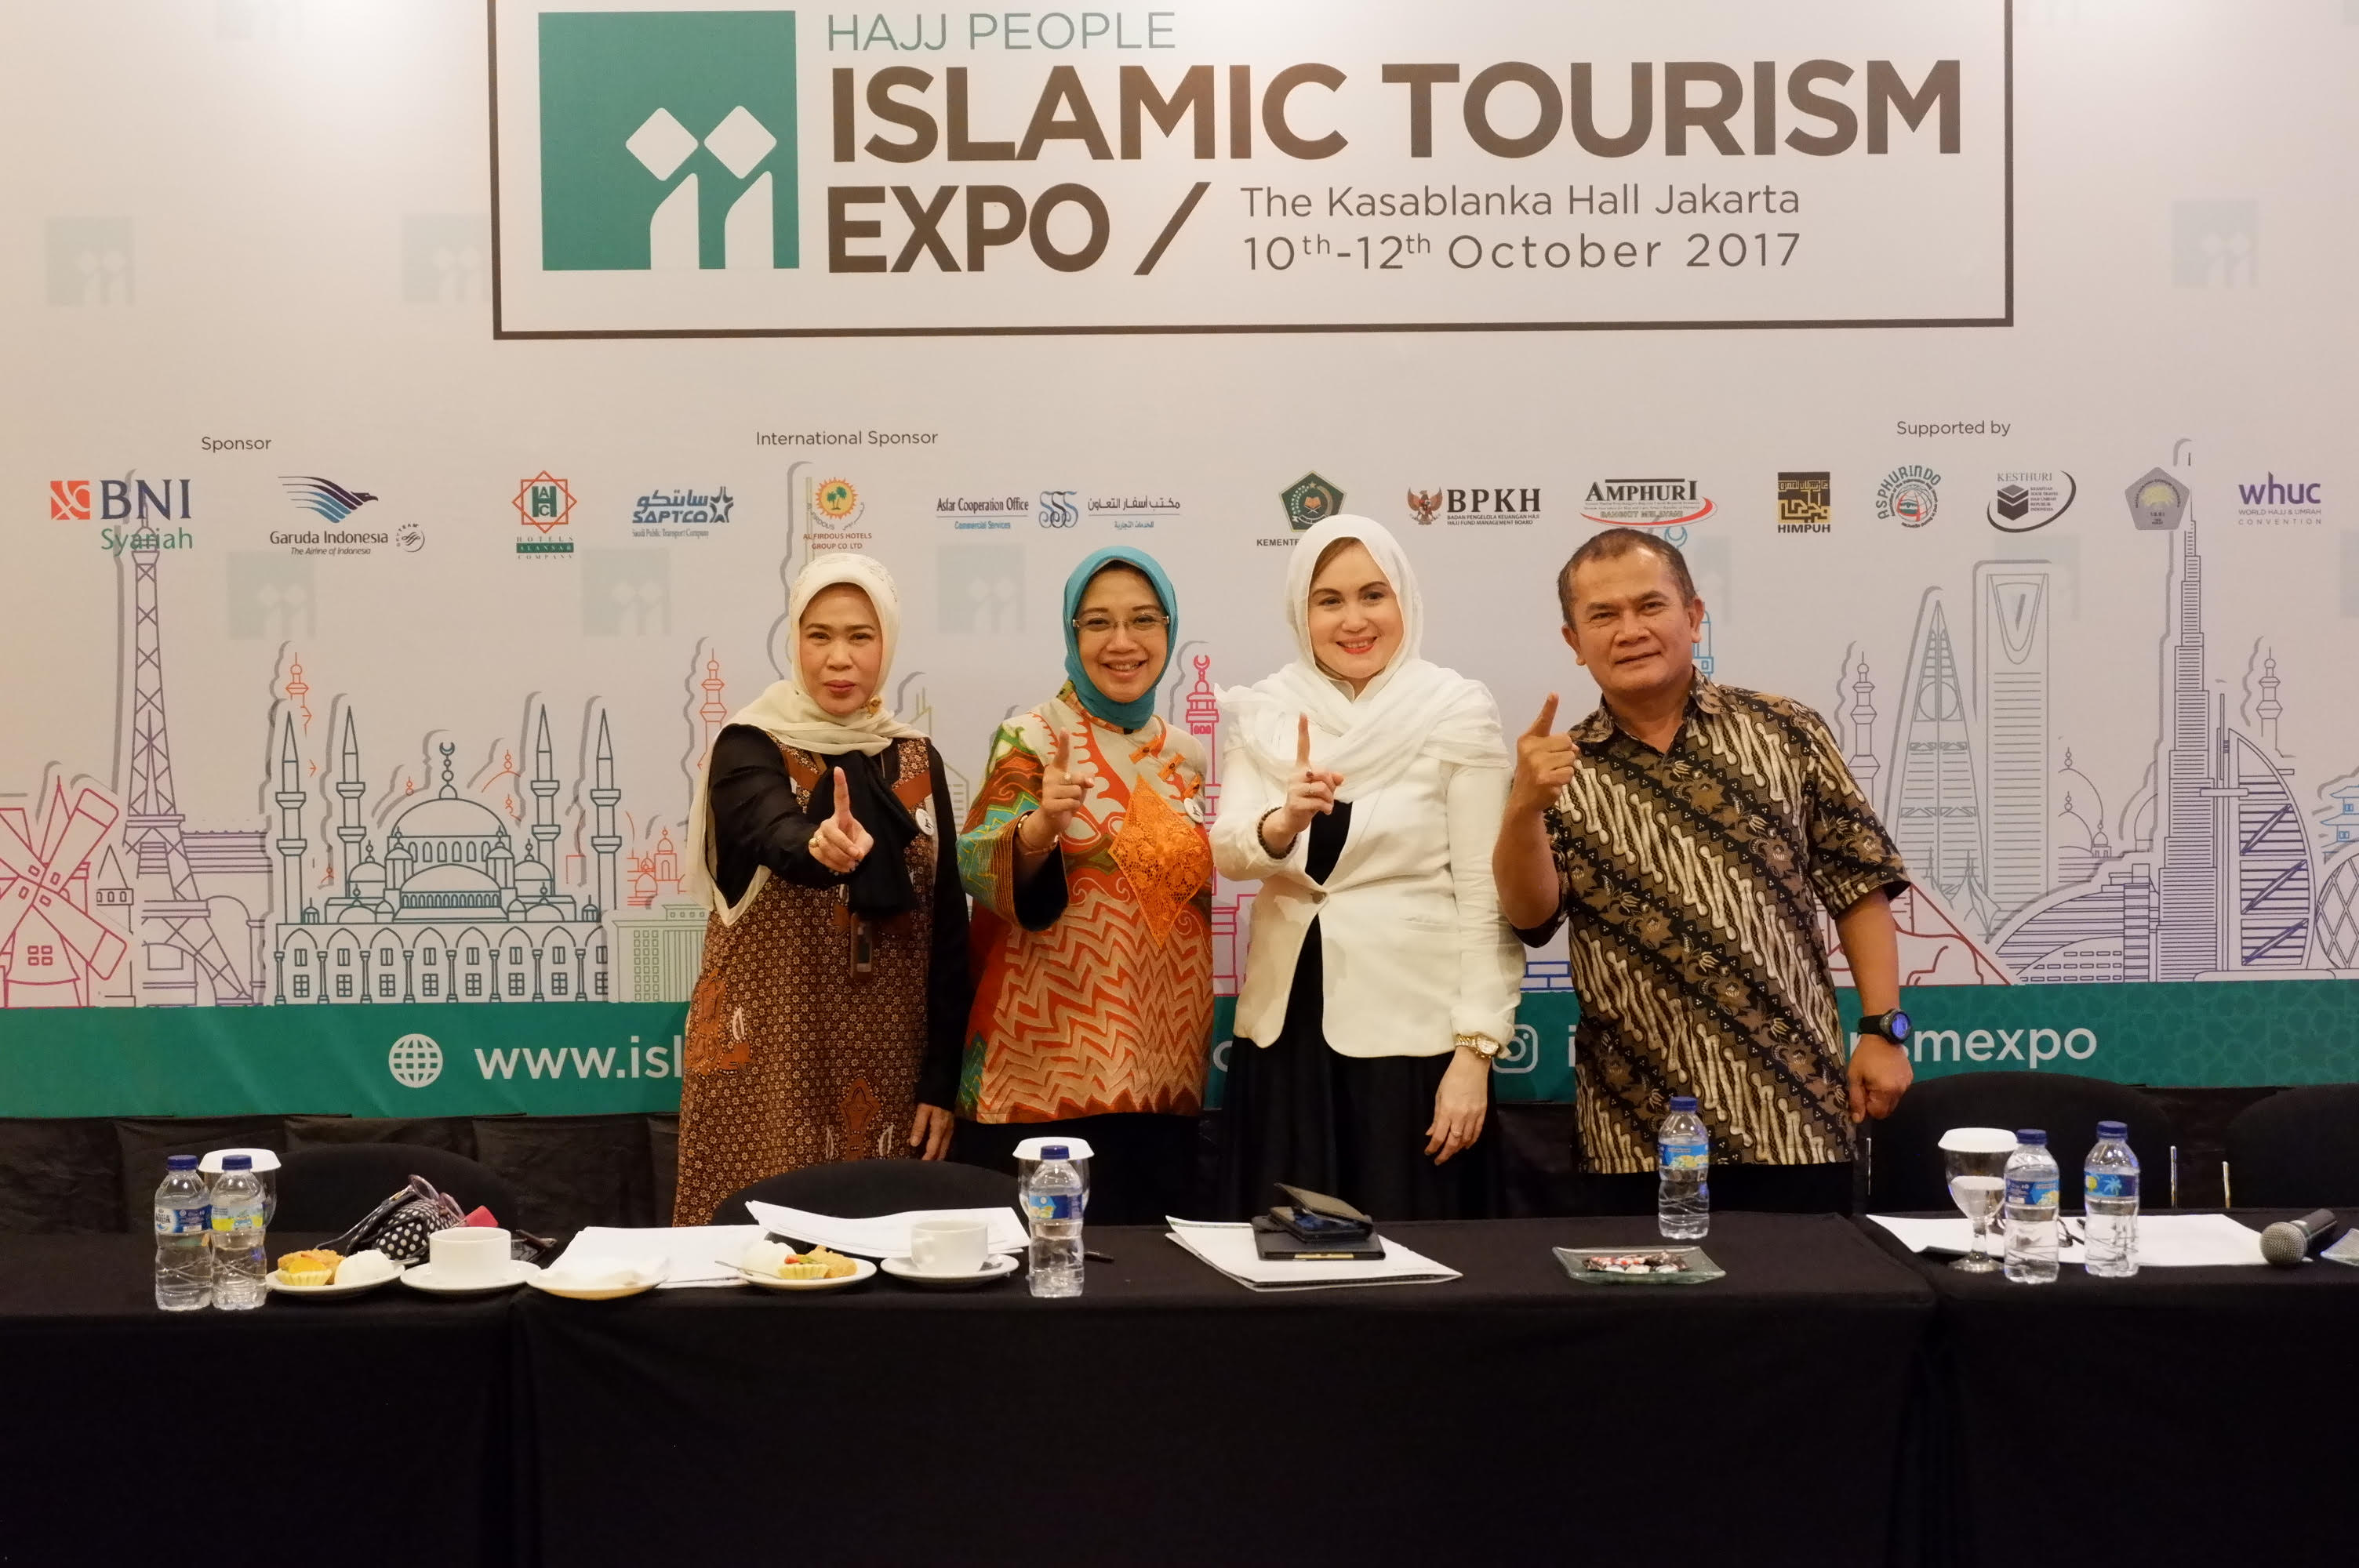 Hajj People – BNI Syariah Akan Gelar Islamic Tourism Expo 2017